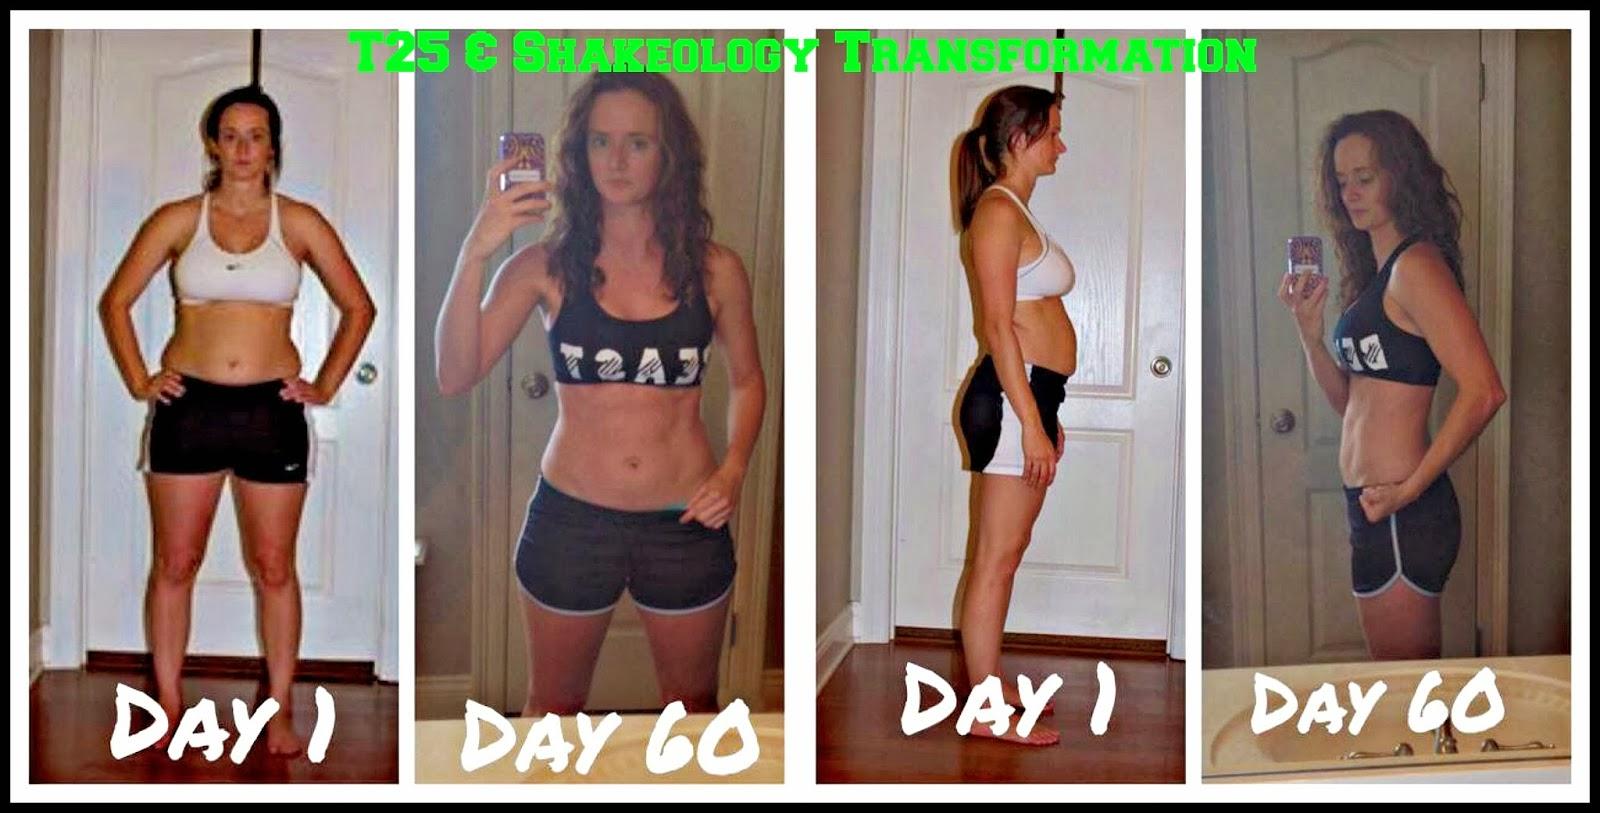 The rob kardashian weight loss images